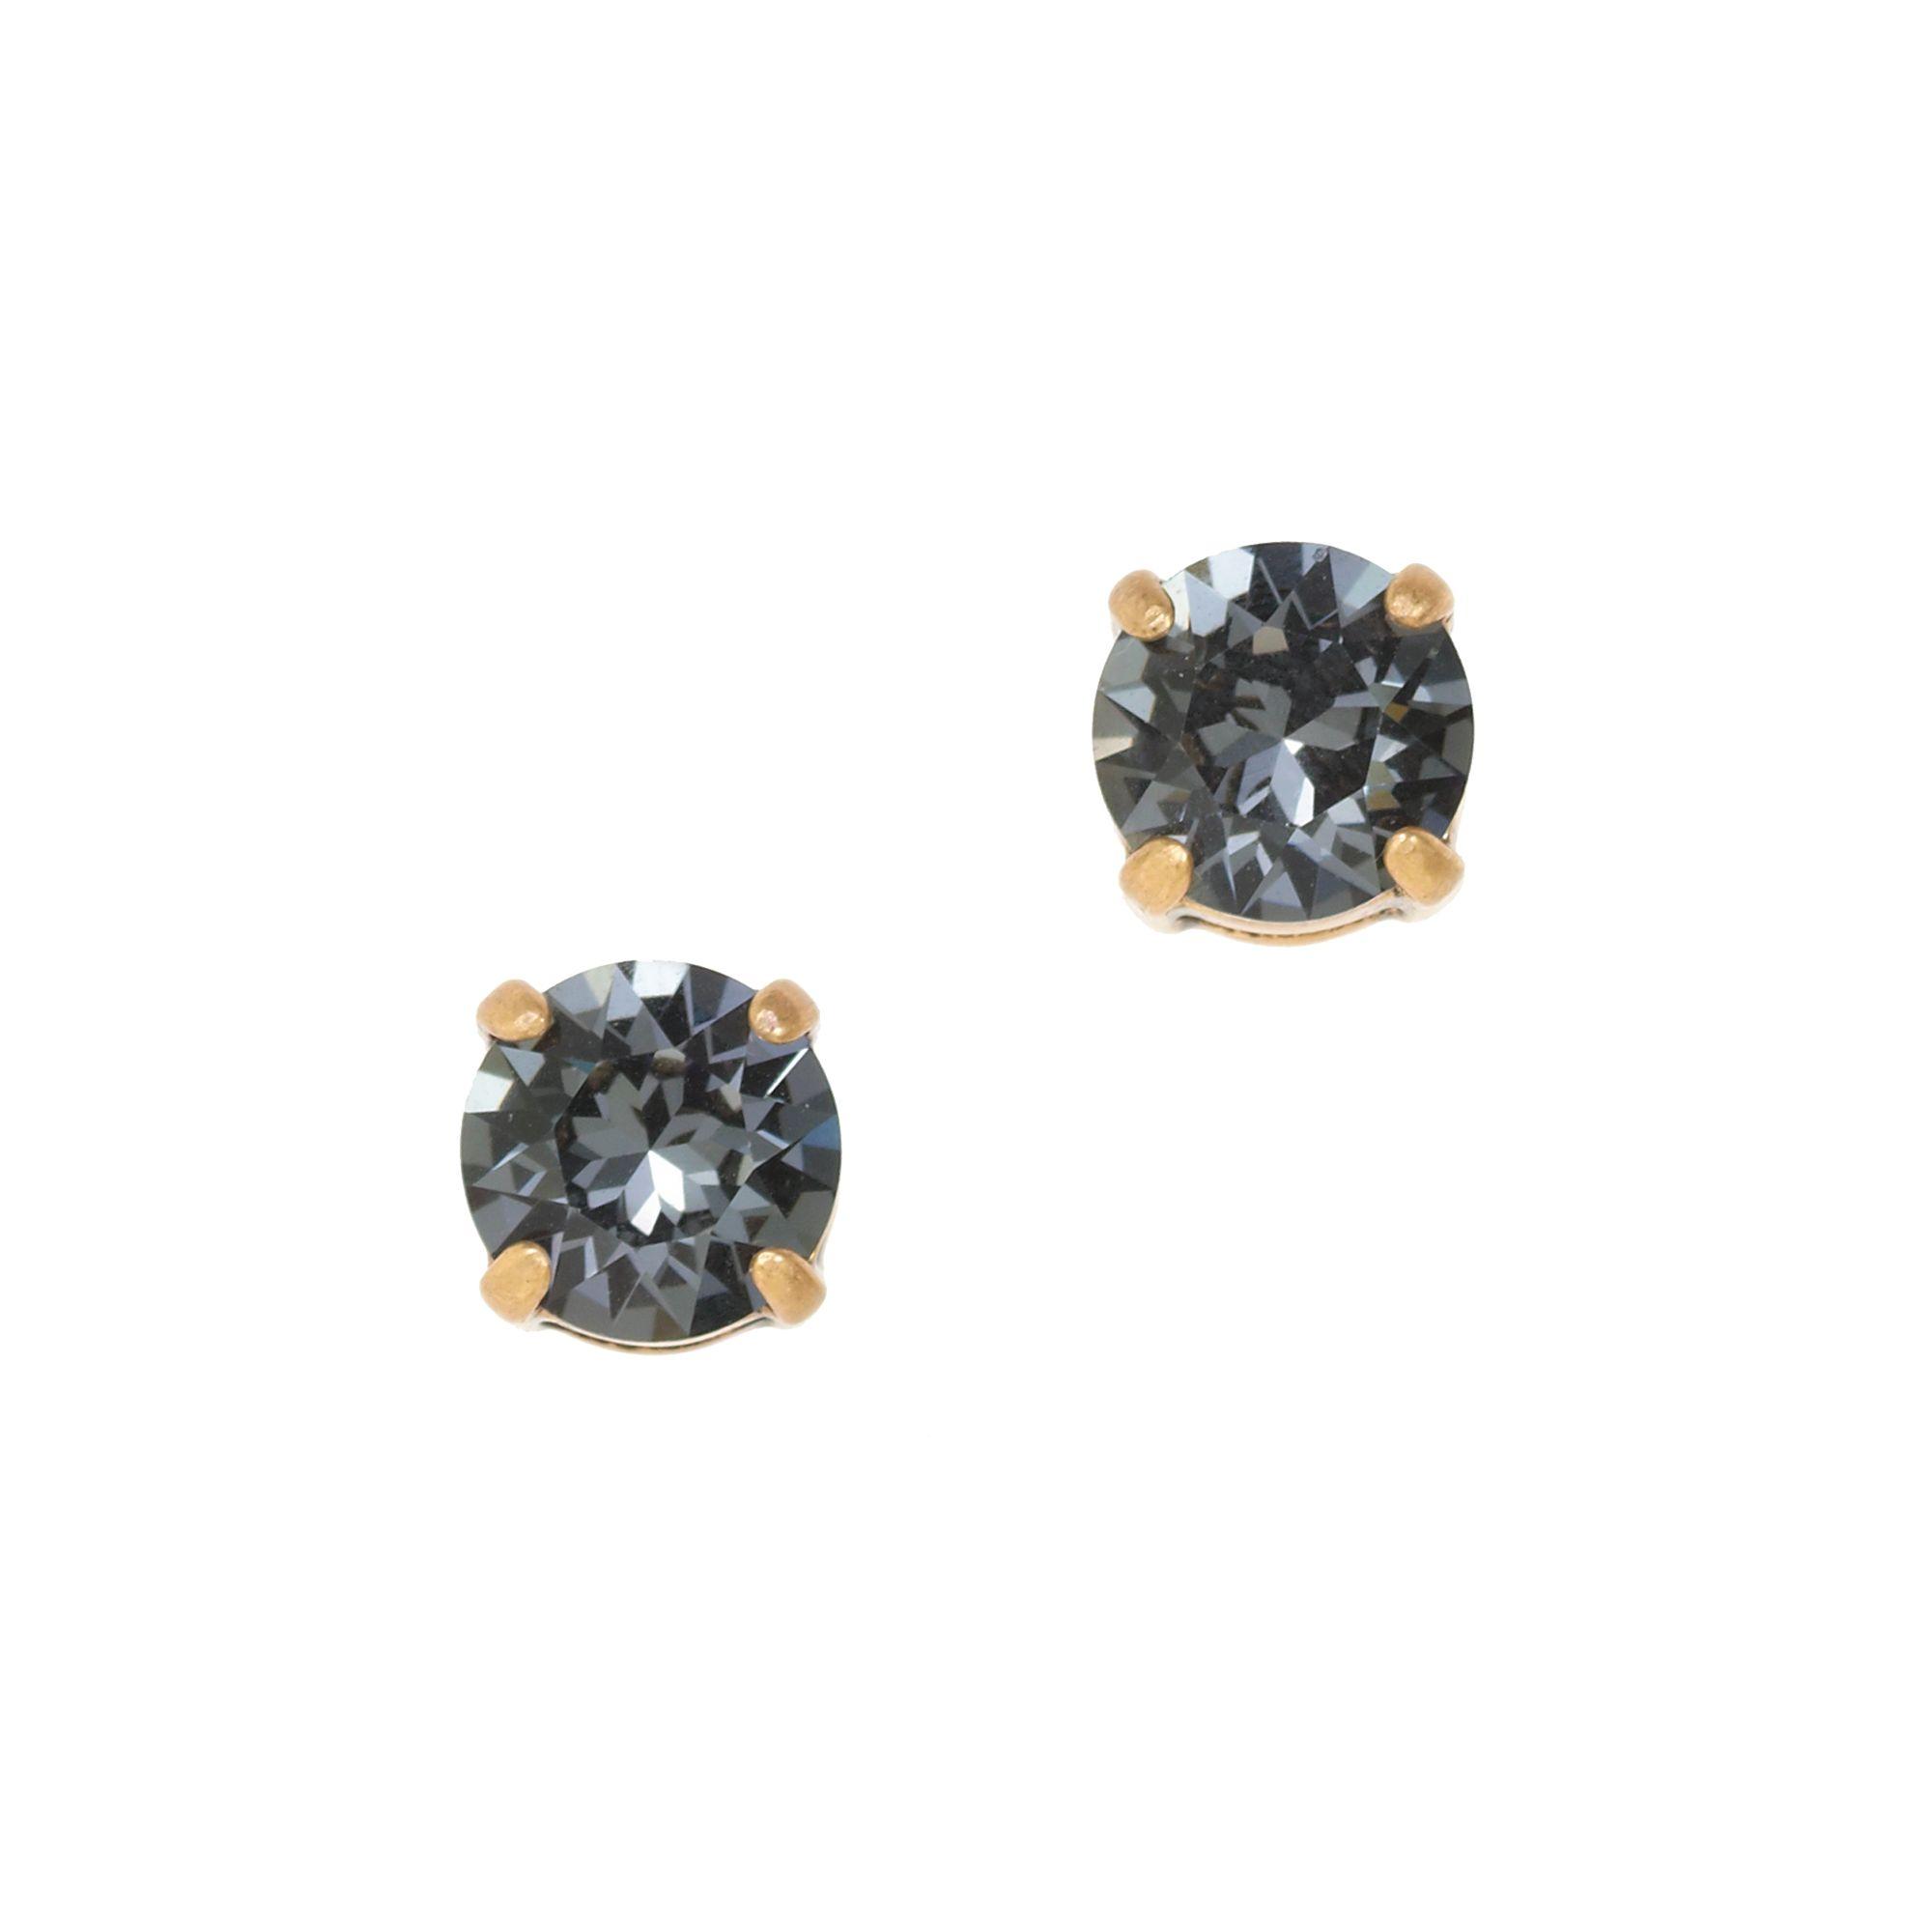 cc1aca285 J.Crew Swarovski Crystal Dot Earrings in Gray - Lyst